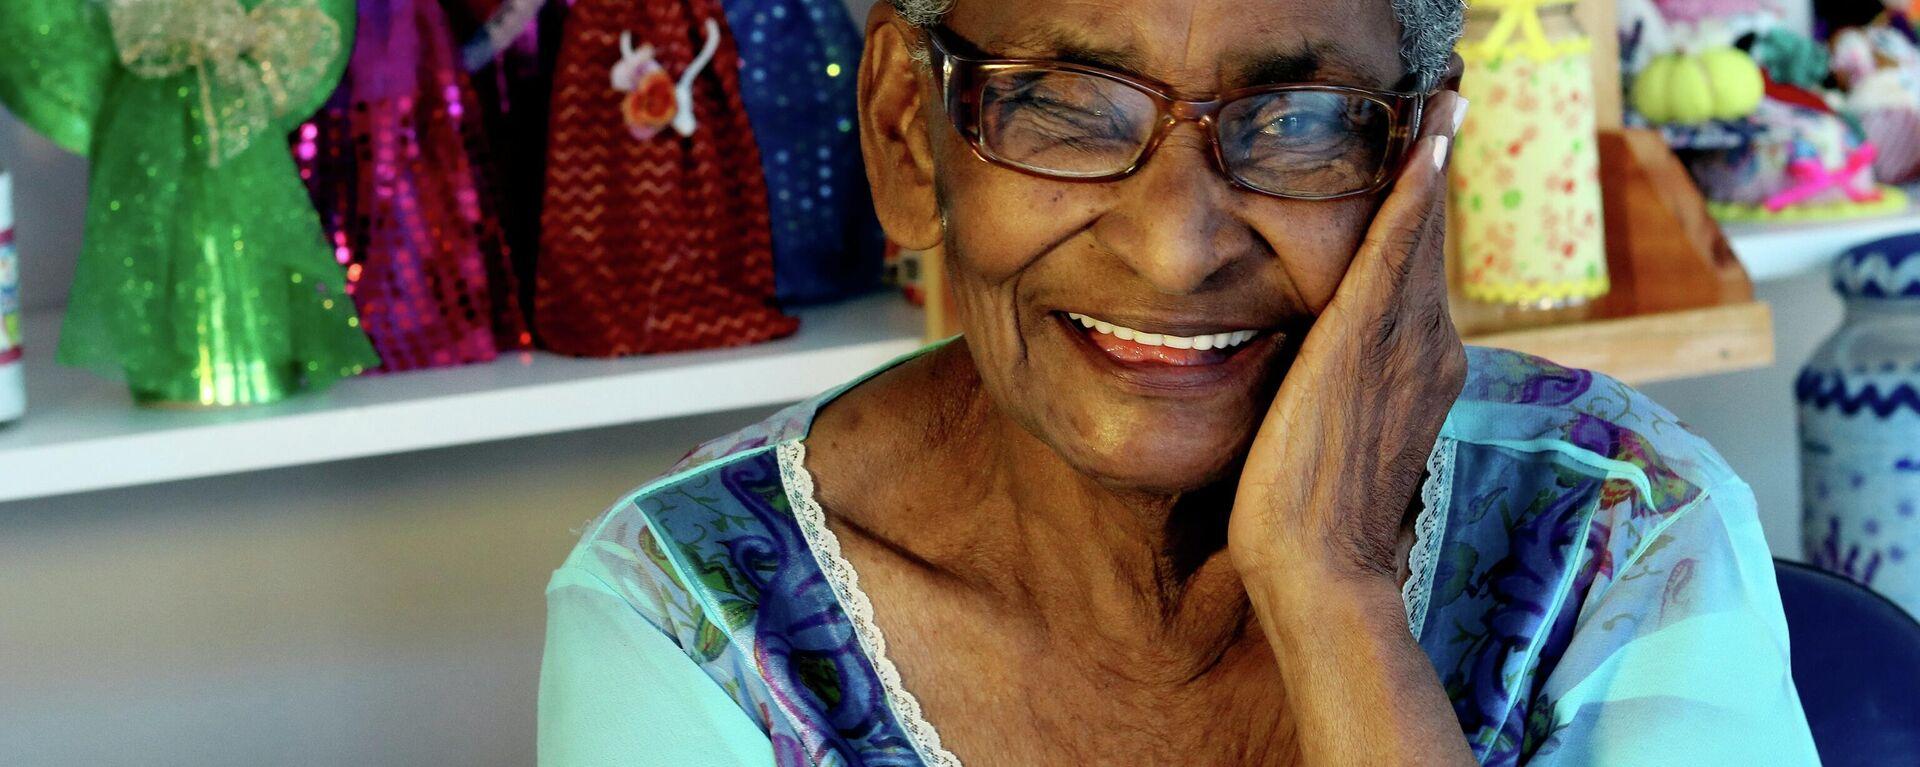 Old brazilian woman smiling - Sputnik Mundo, 1920, 15.06.2021